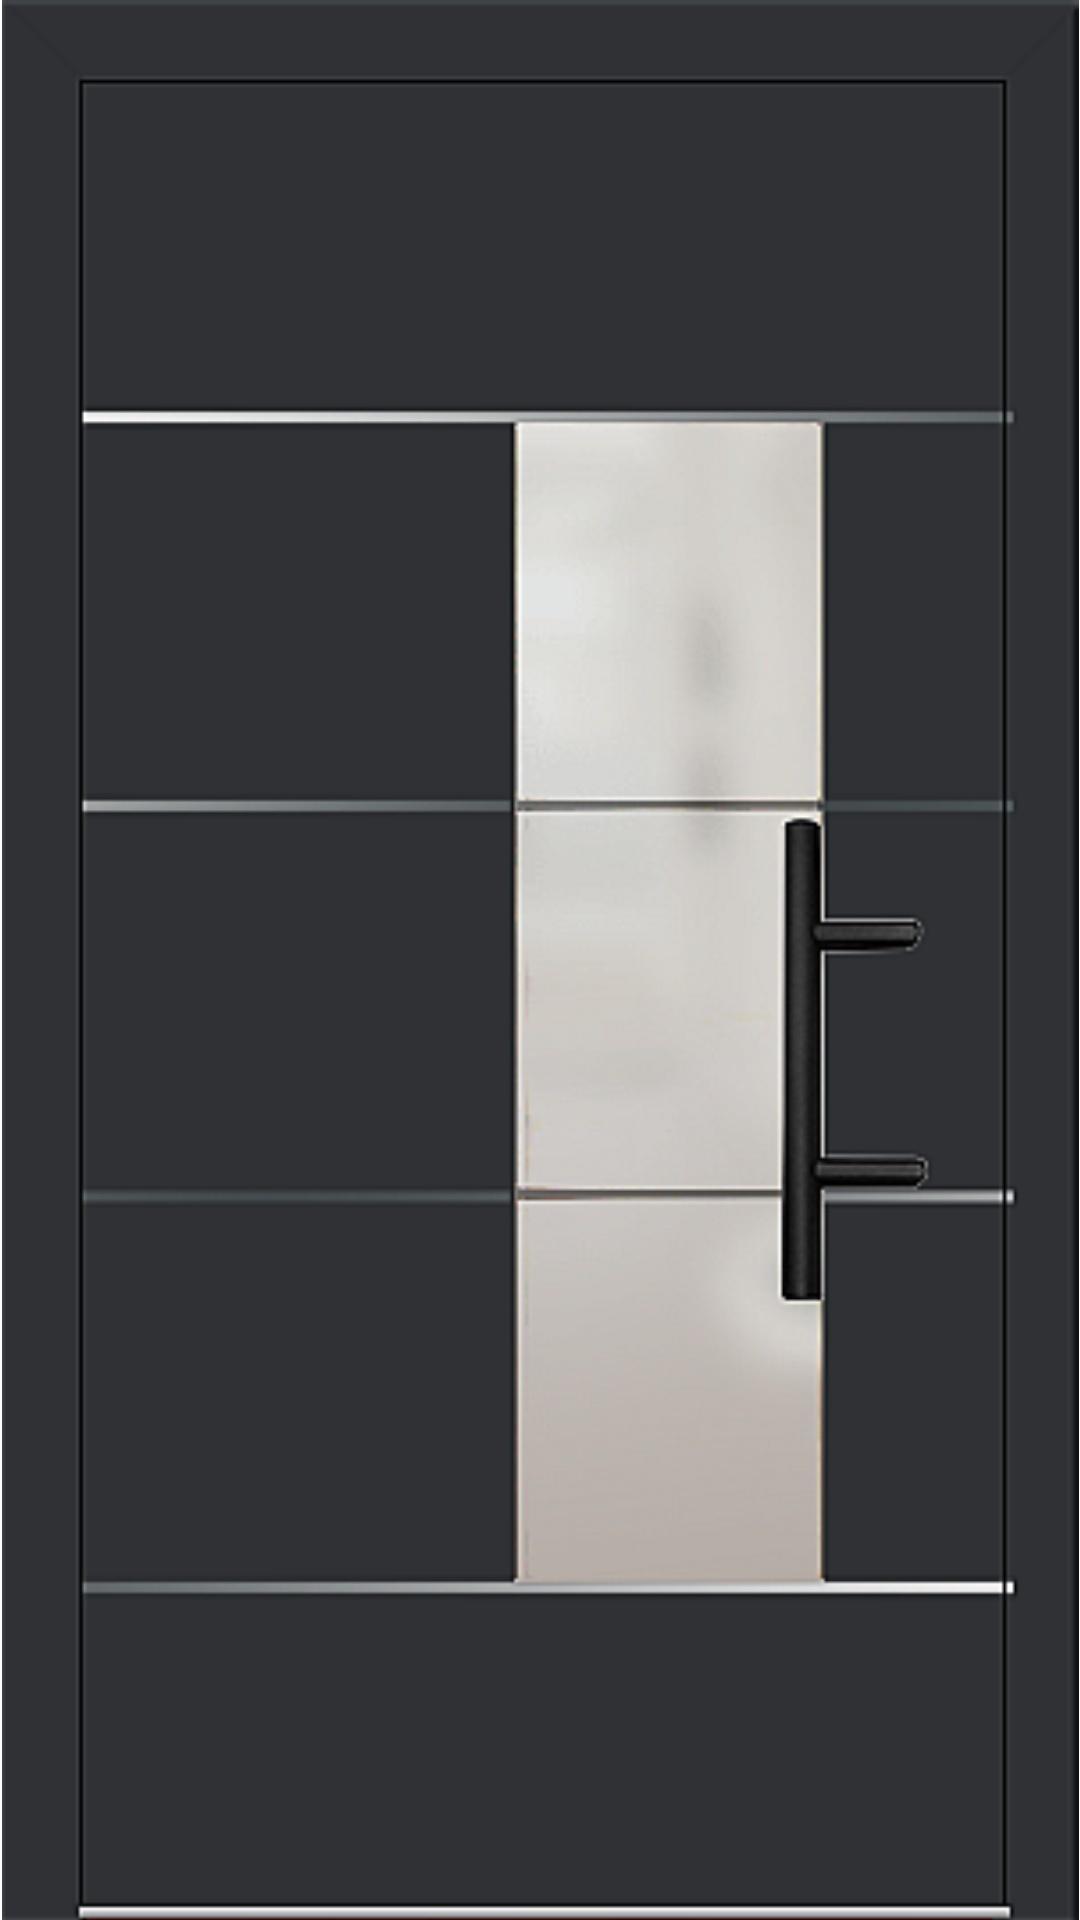 Holz-Alu Haustür Modell 66878 schwarz